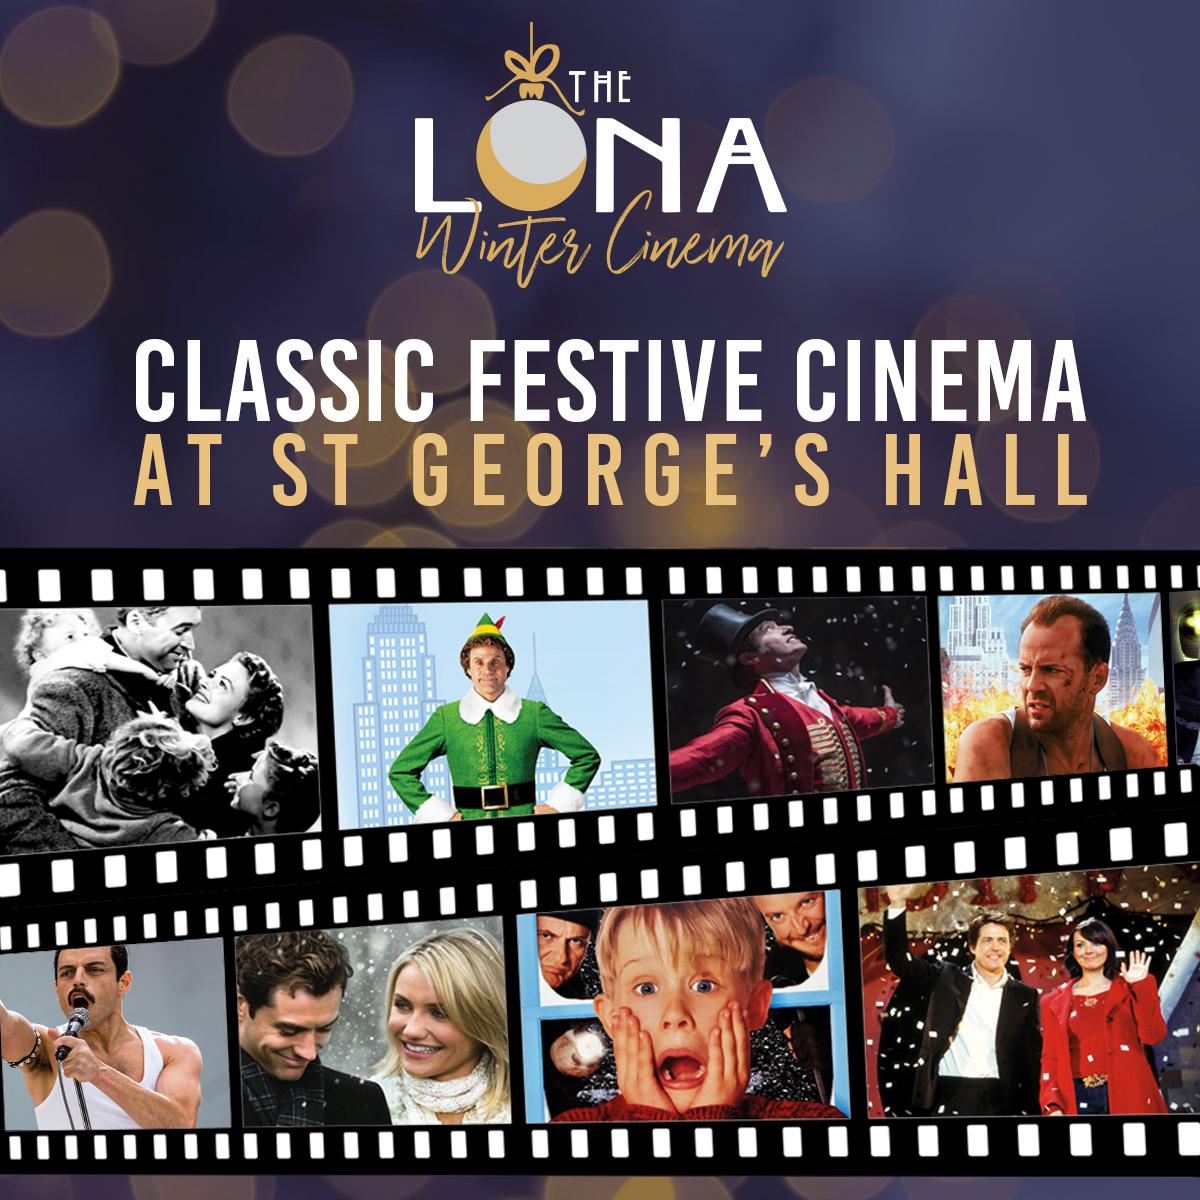 Luna Winter Cinema 2019